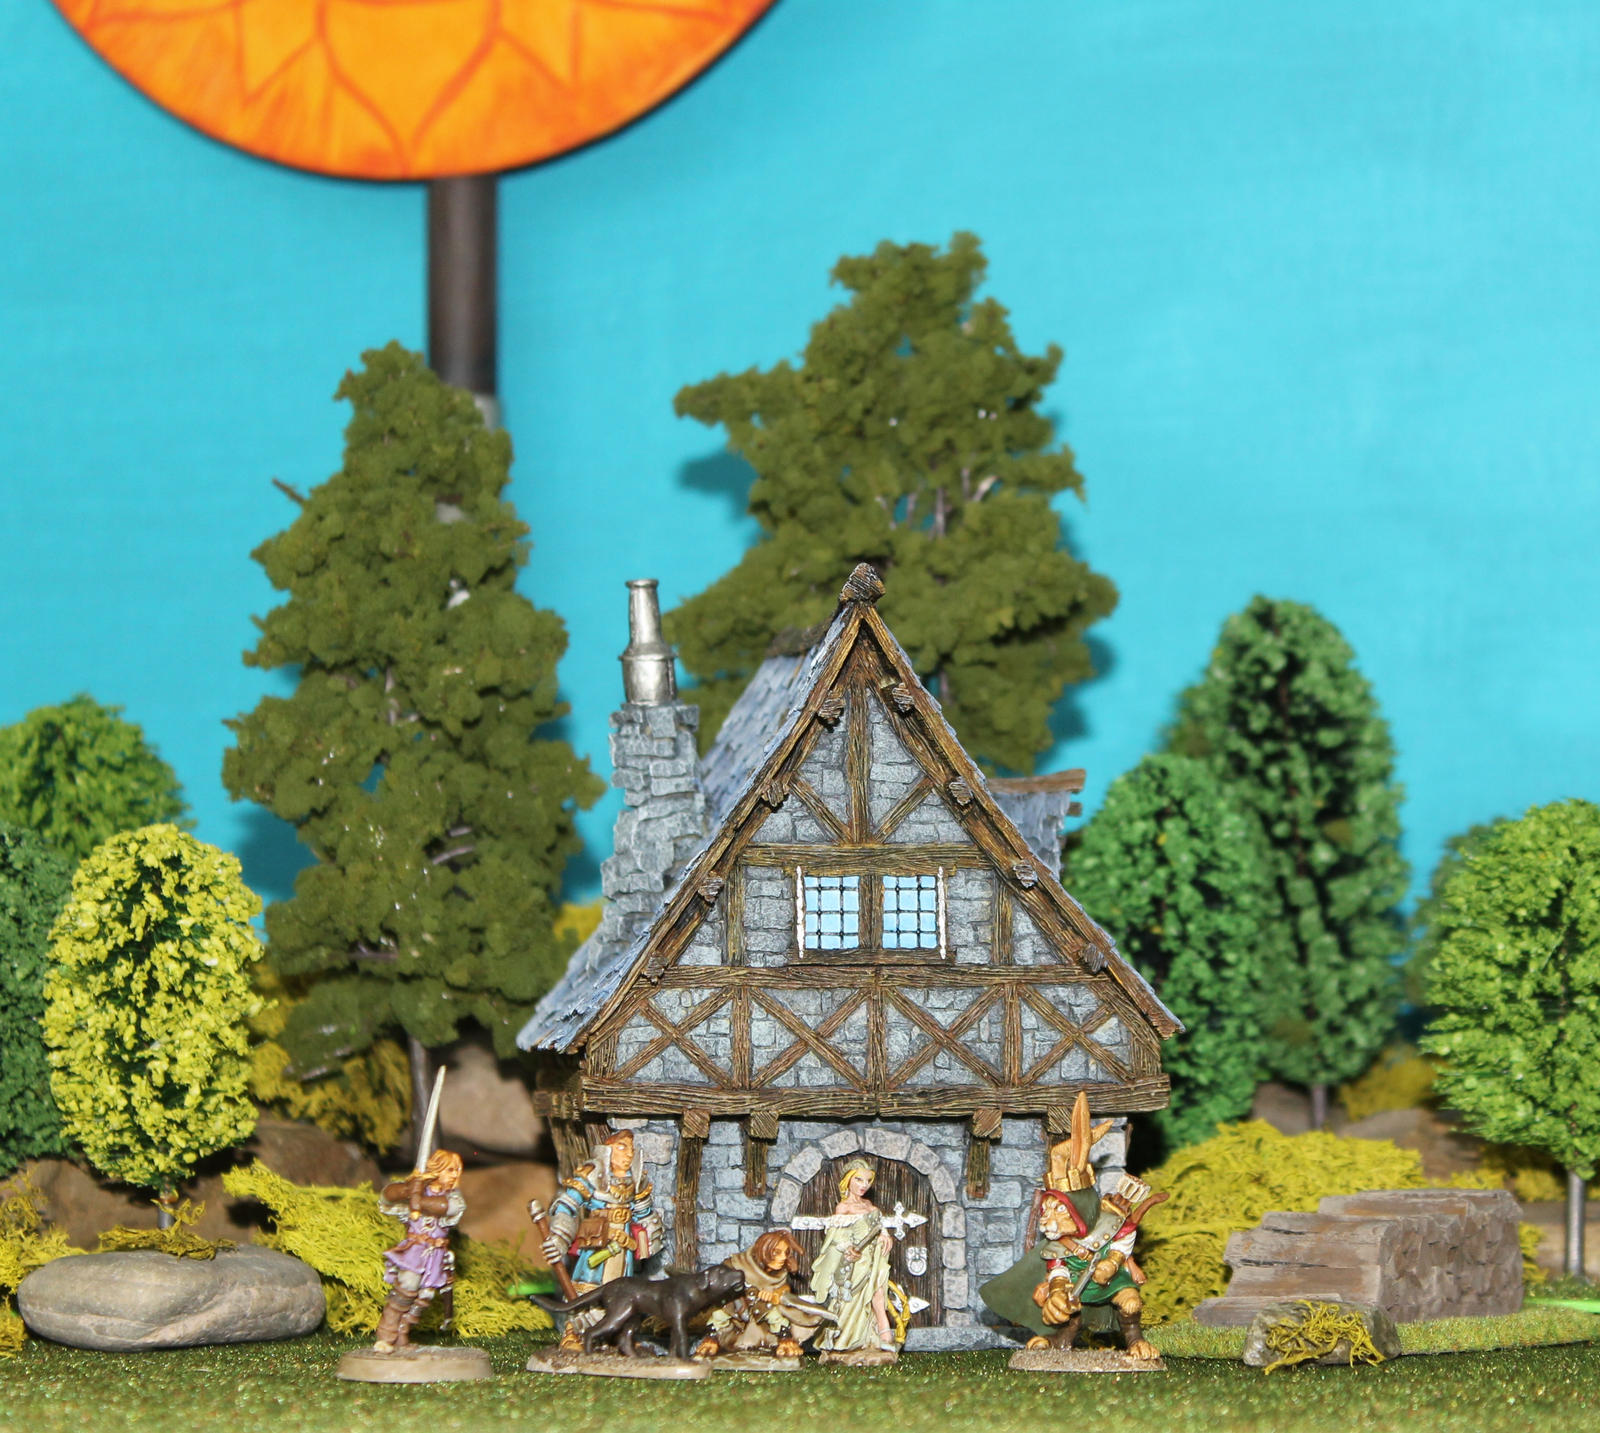 Pathfinder The Harrowing Rabbit Prince by MrVergee